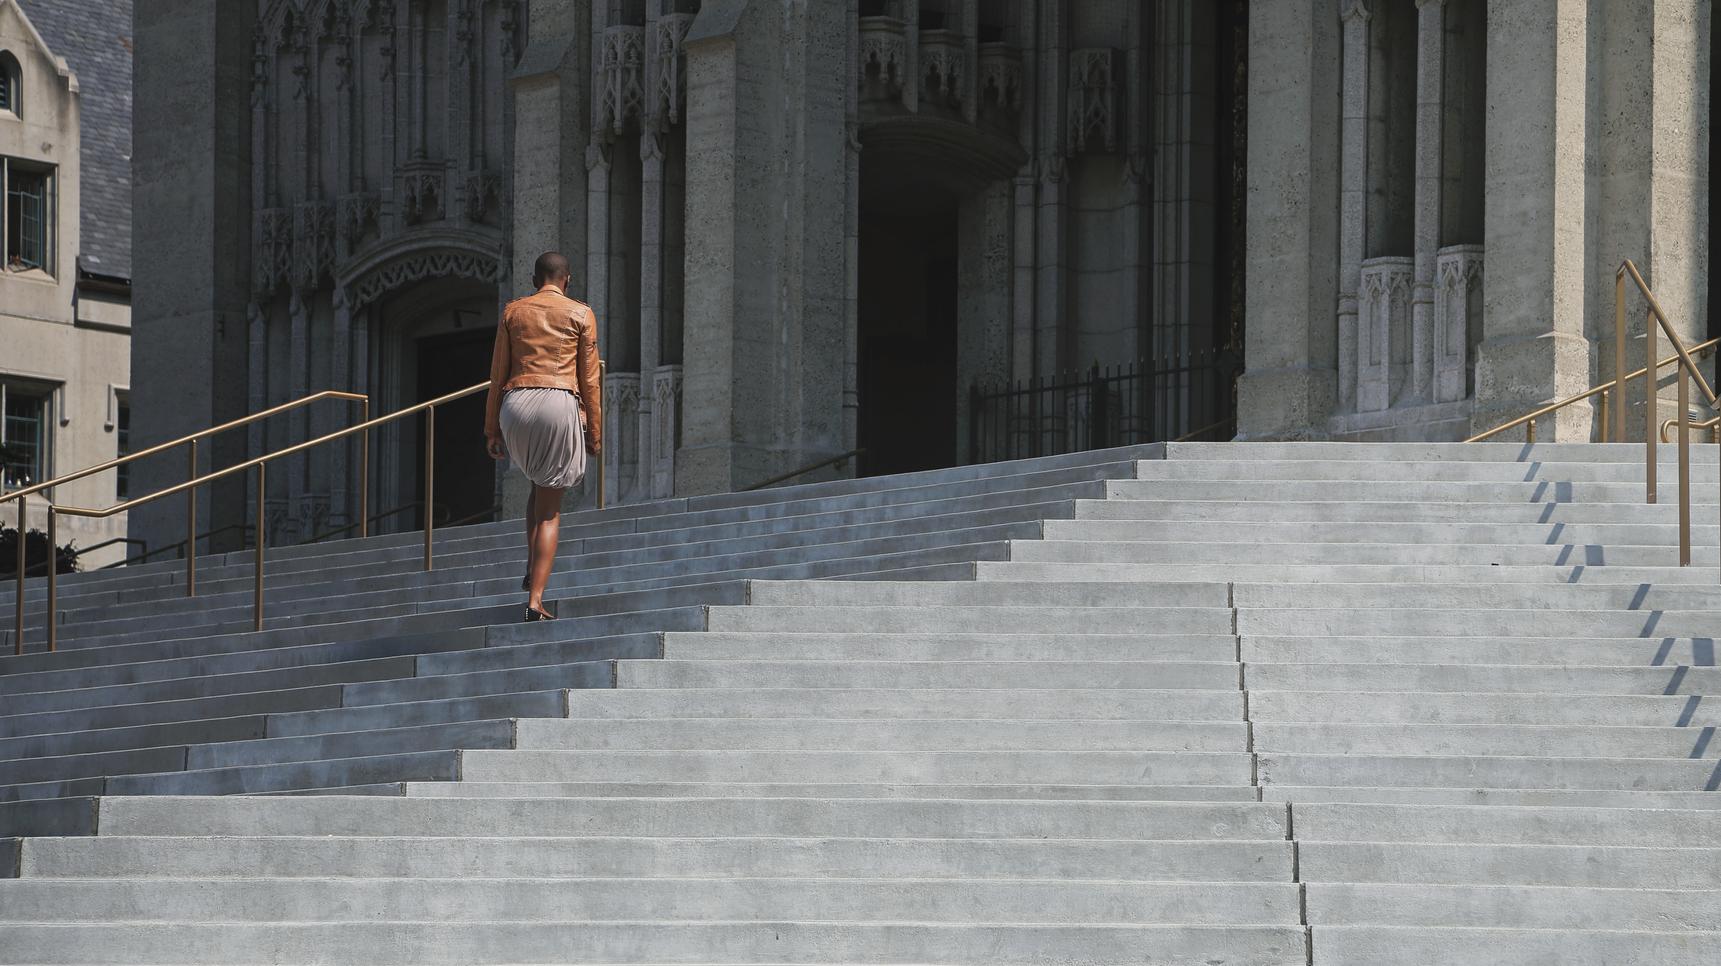 Javier_Montes_dArce_New_York_Film_10_.pn